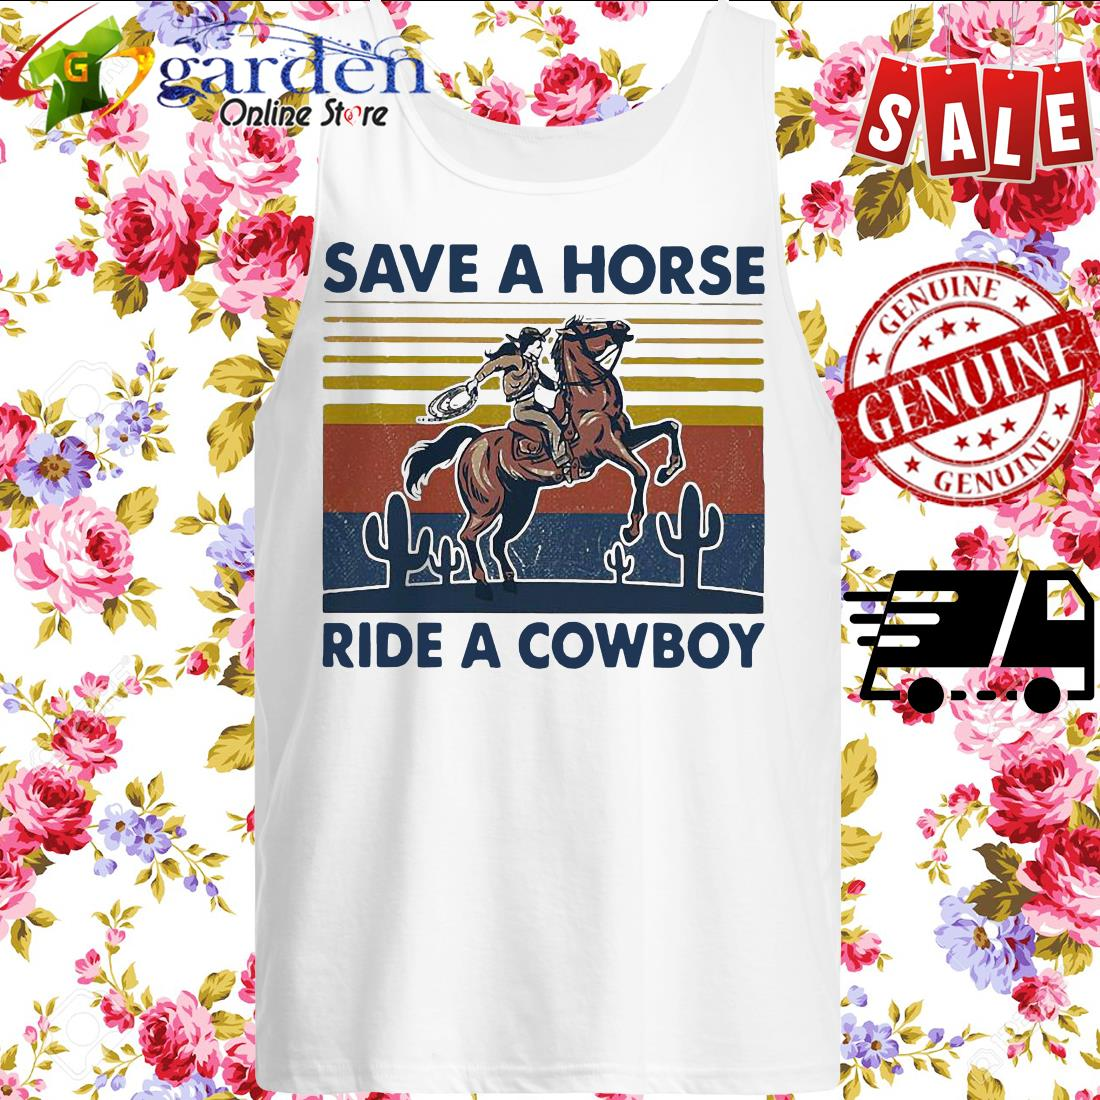 Save a horse ride a cowboy vintage tank top